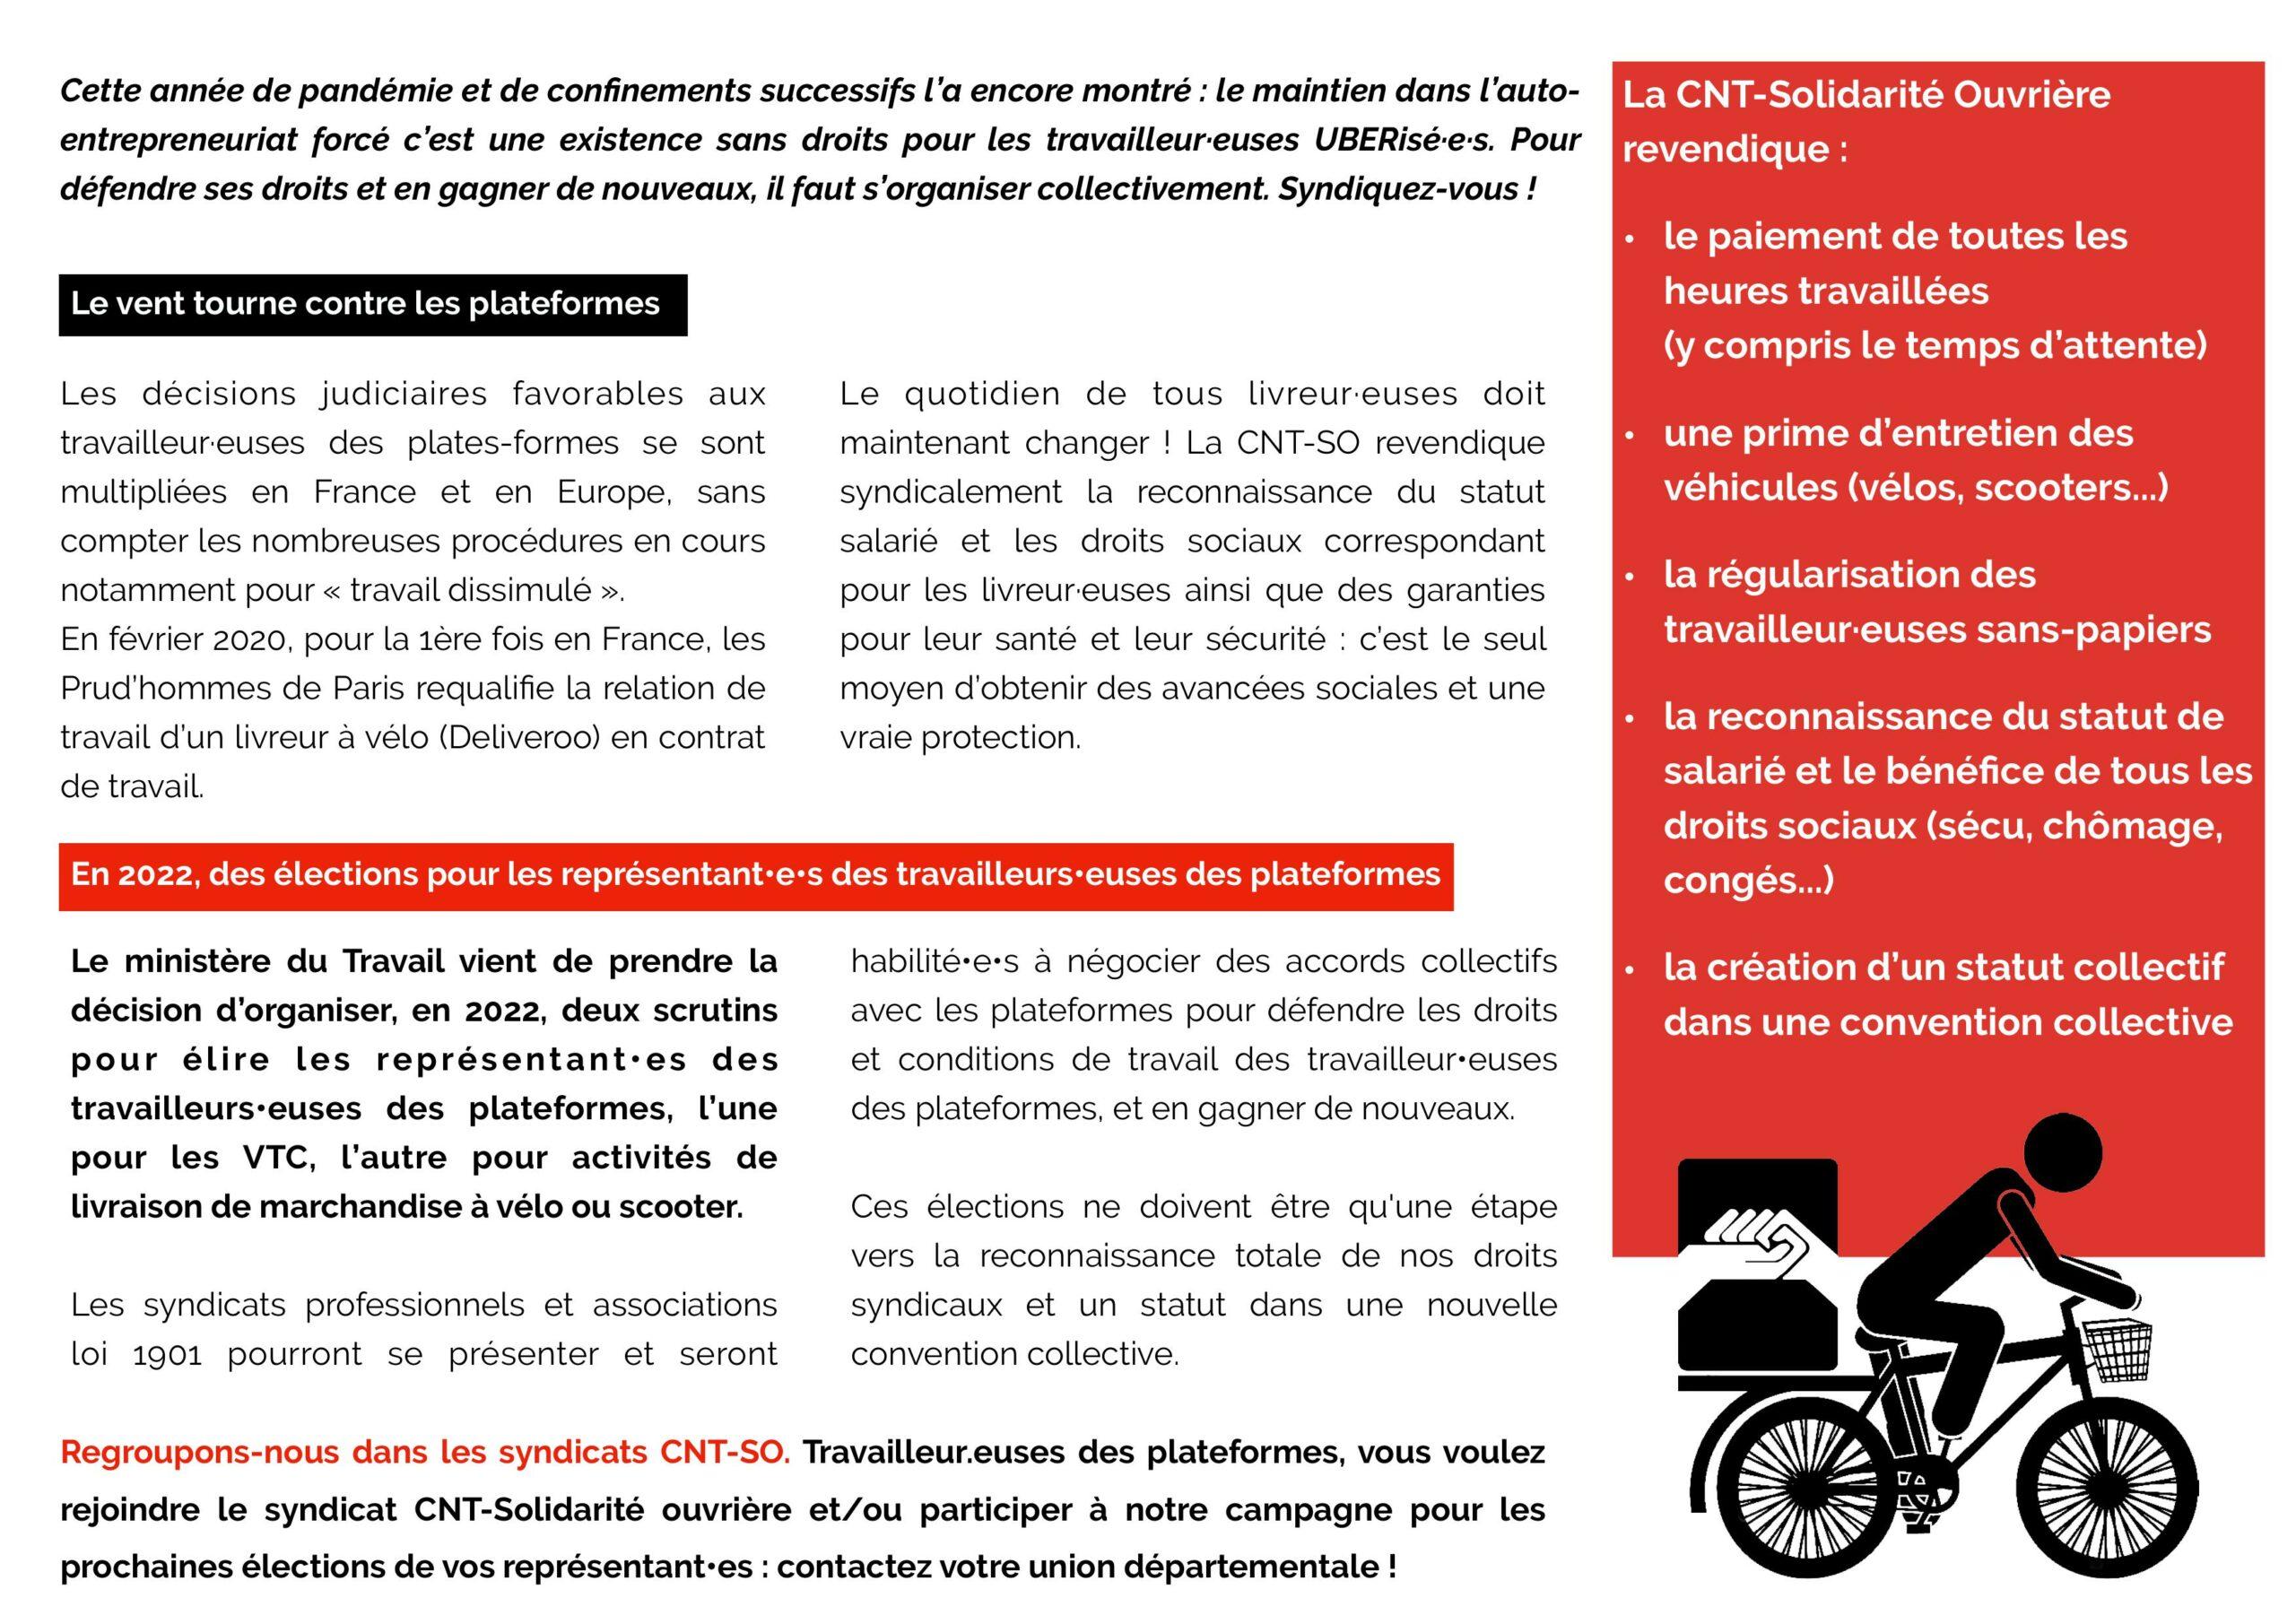 livreurs-13-p2.jpg